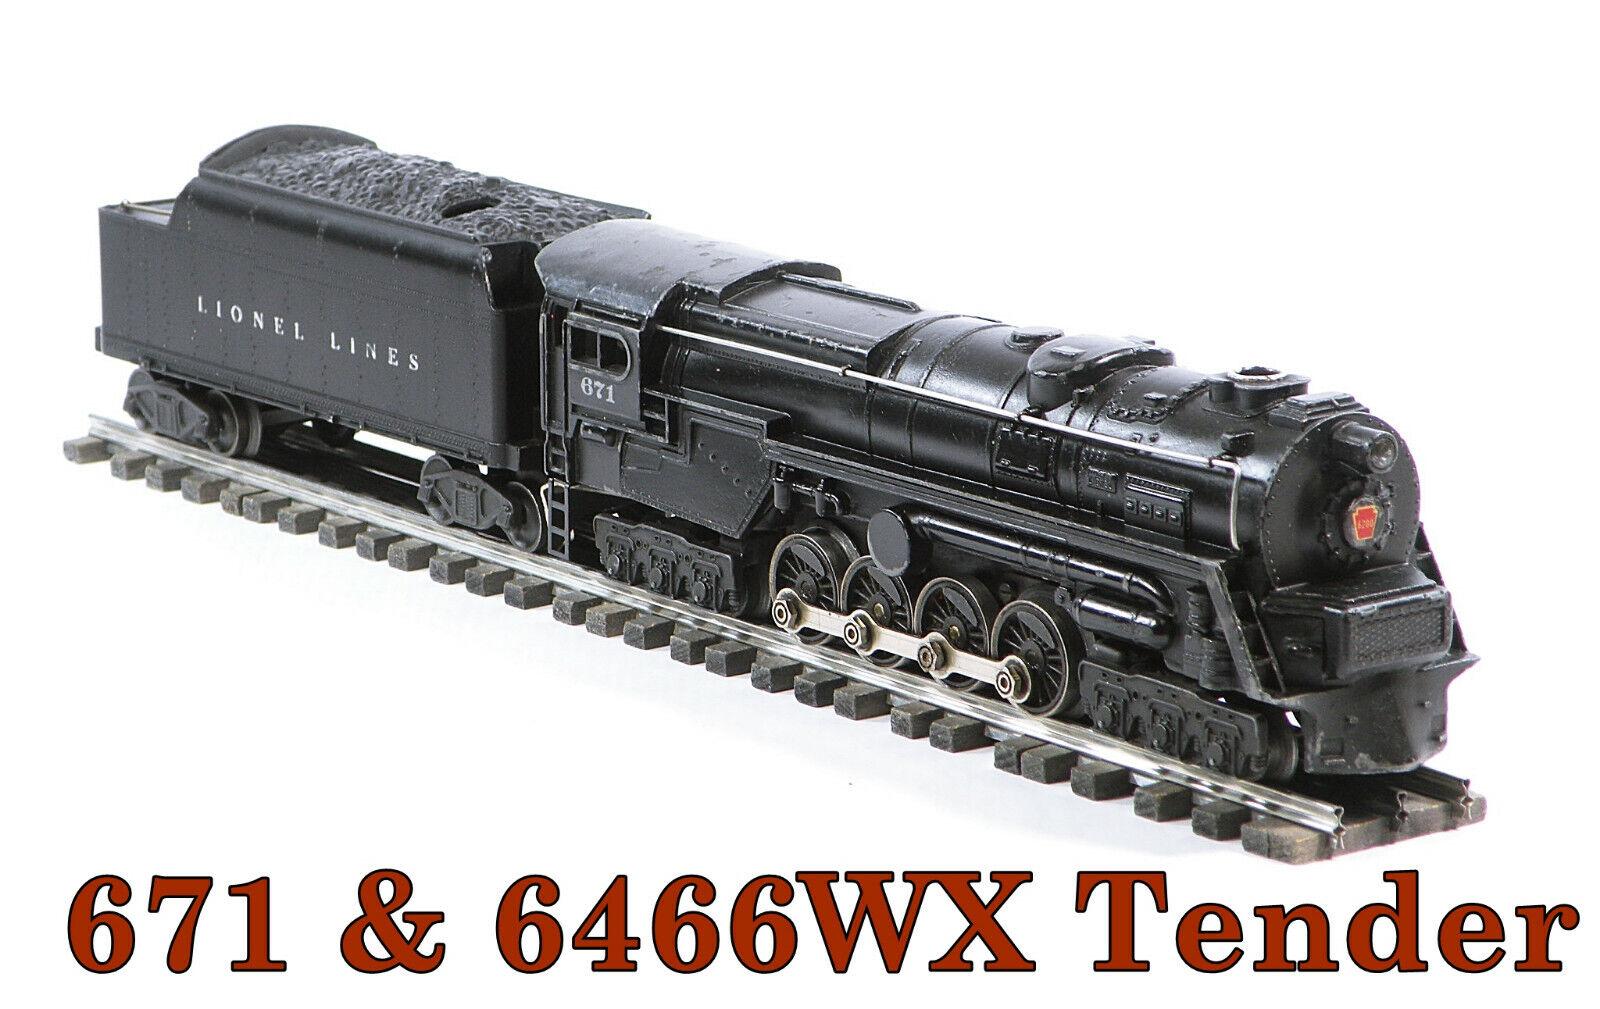 Lionel PW Turbine & 6466WX Tender Steam Loco (5) 1946